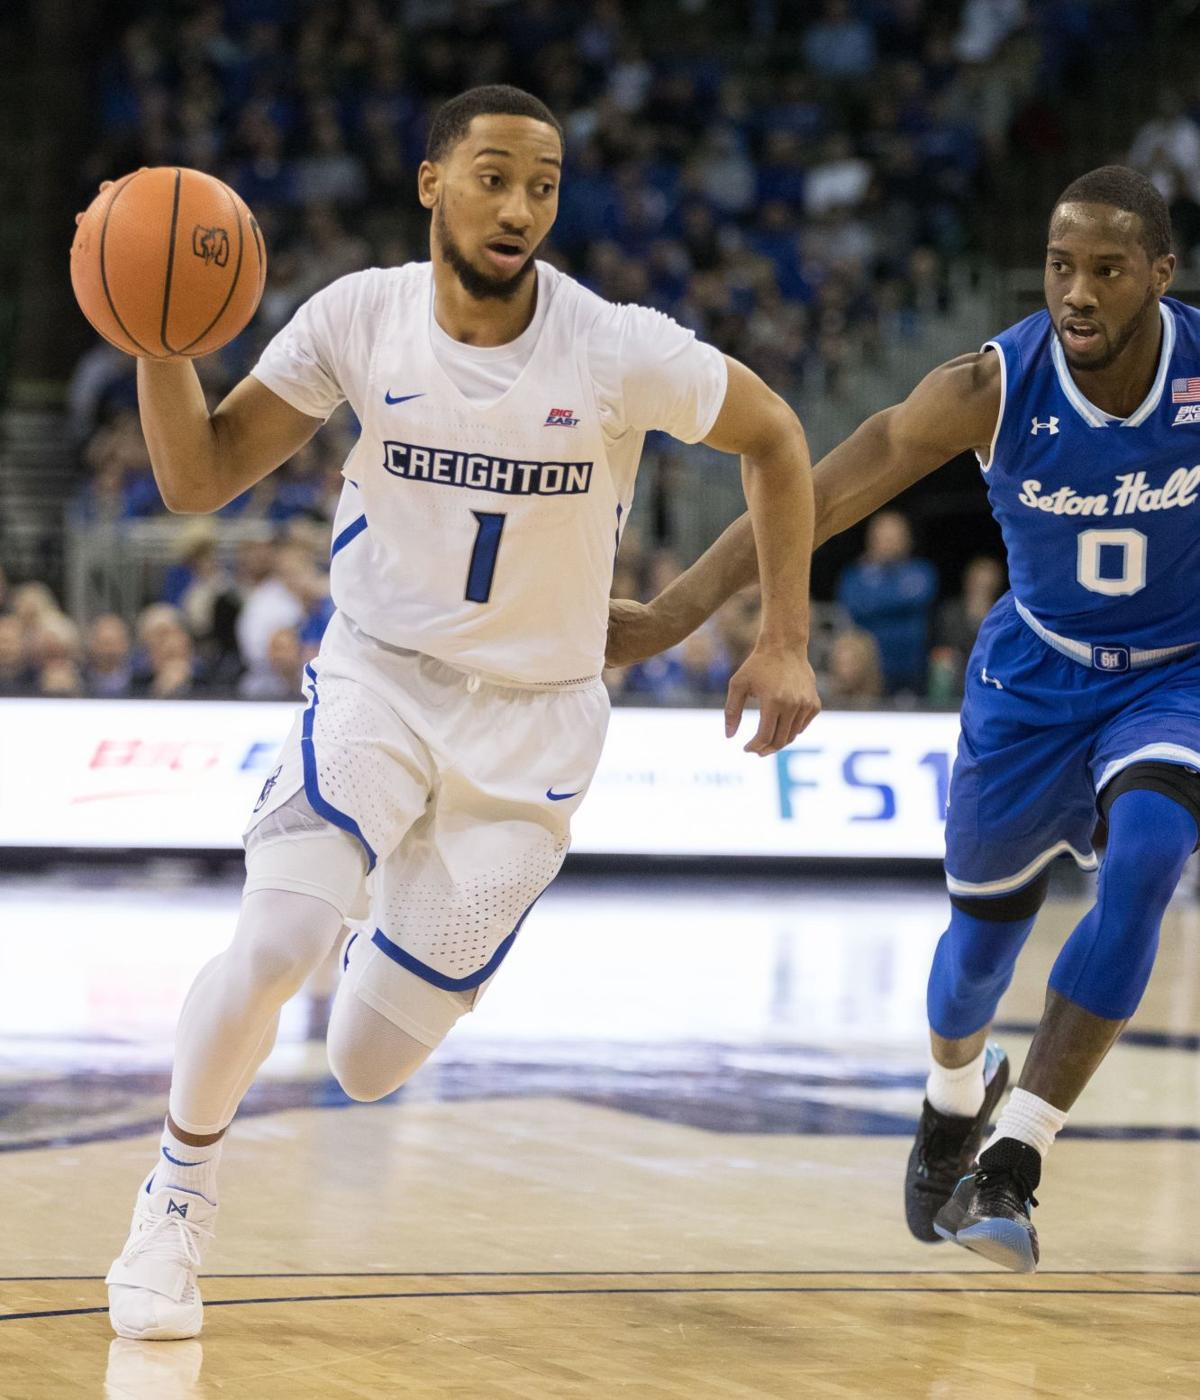 NCAA tournament destination a homecoming for Creighton's Davion Mintz, Ty-Shon Alexander